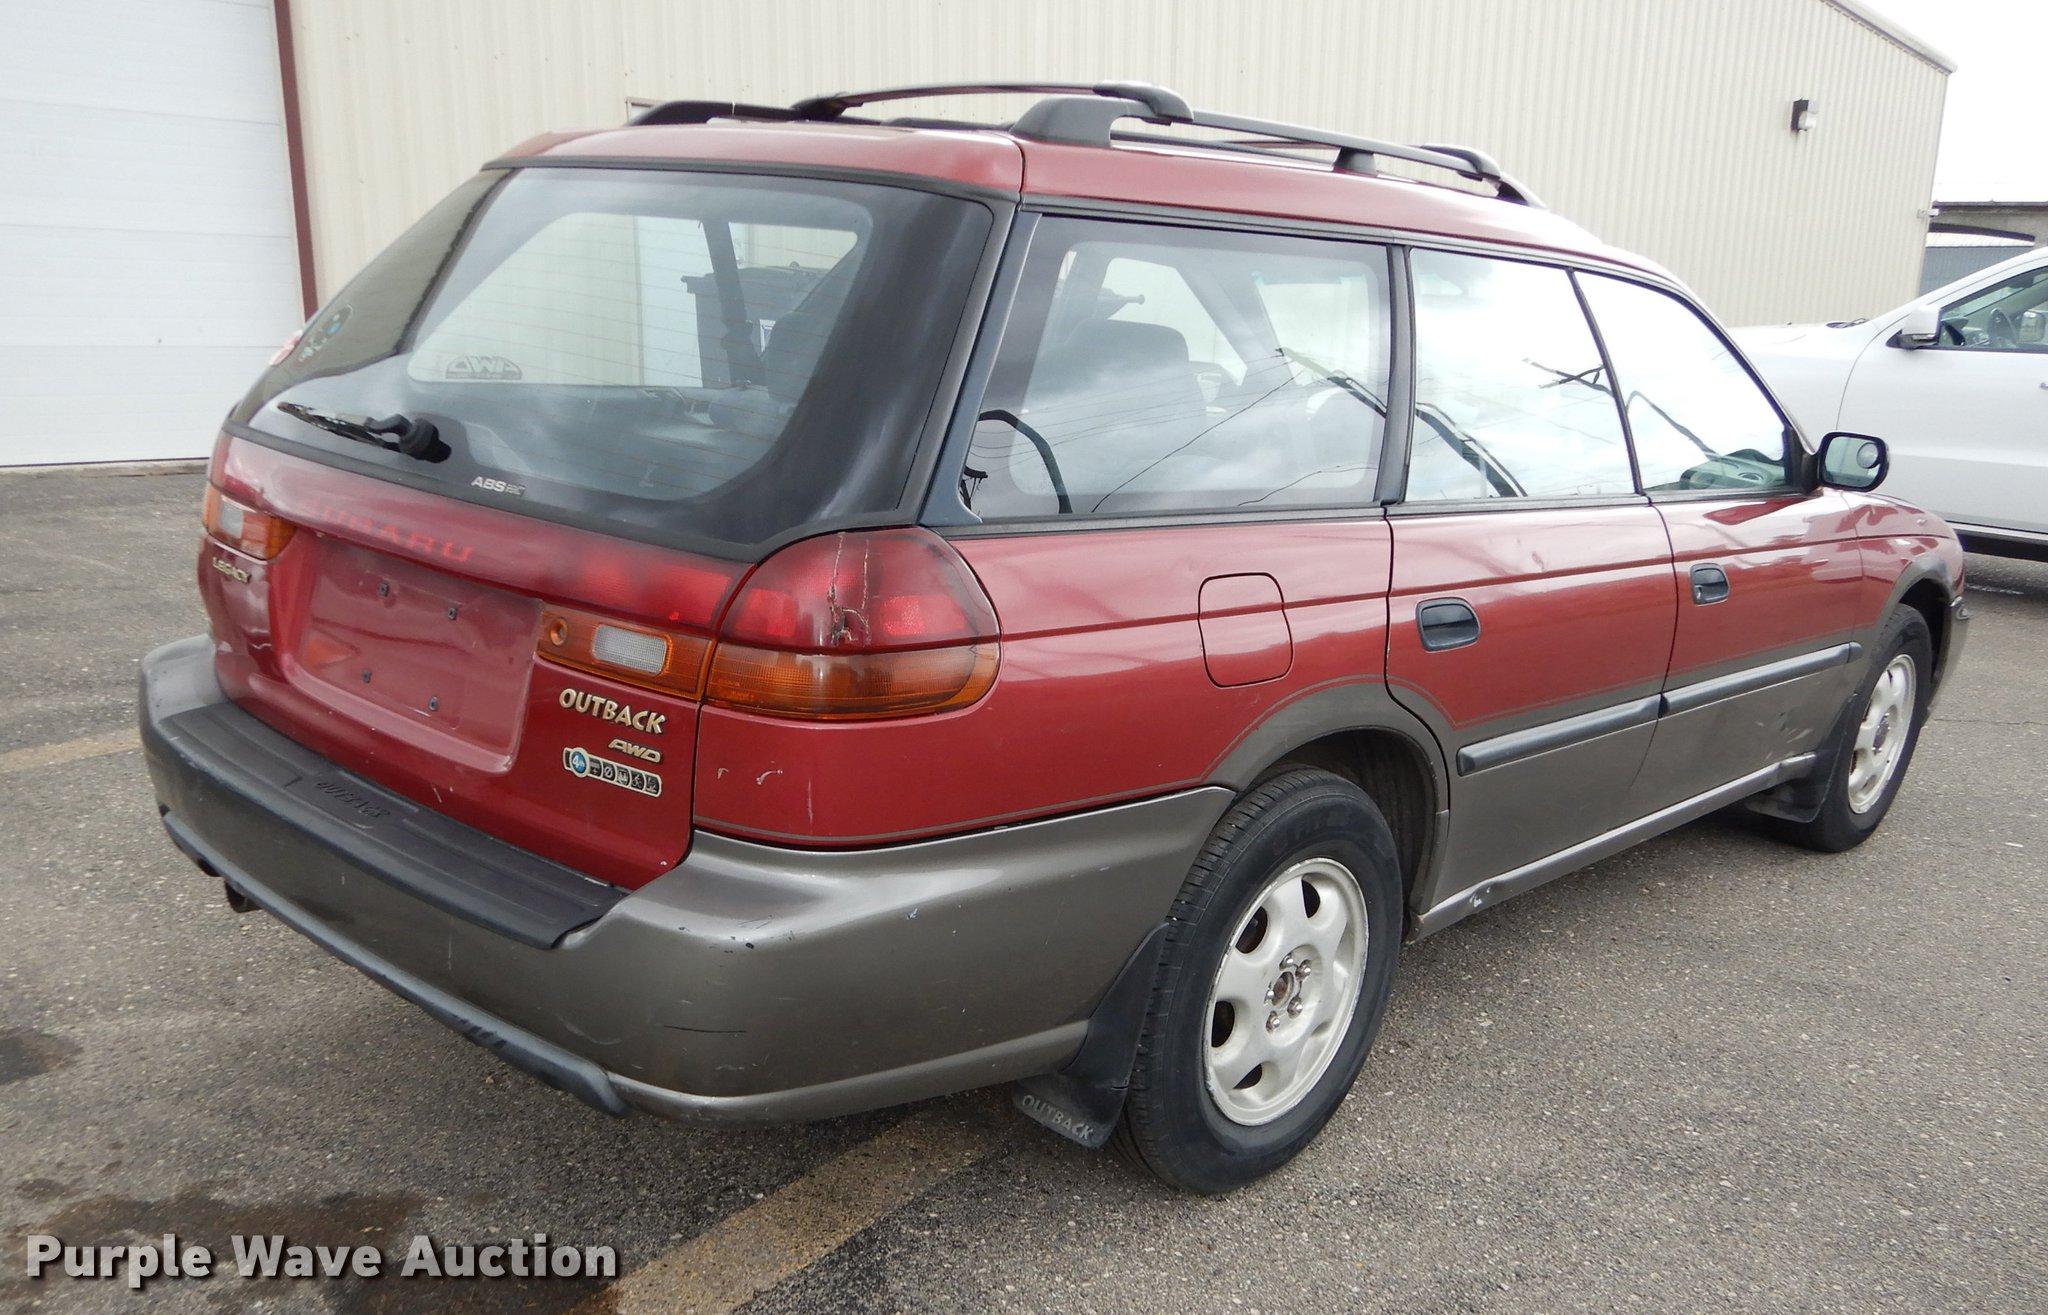 1998 Subaru Legacy Wagon Outback Item De1781 Sold July Full Size In New Window